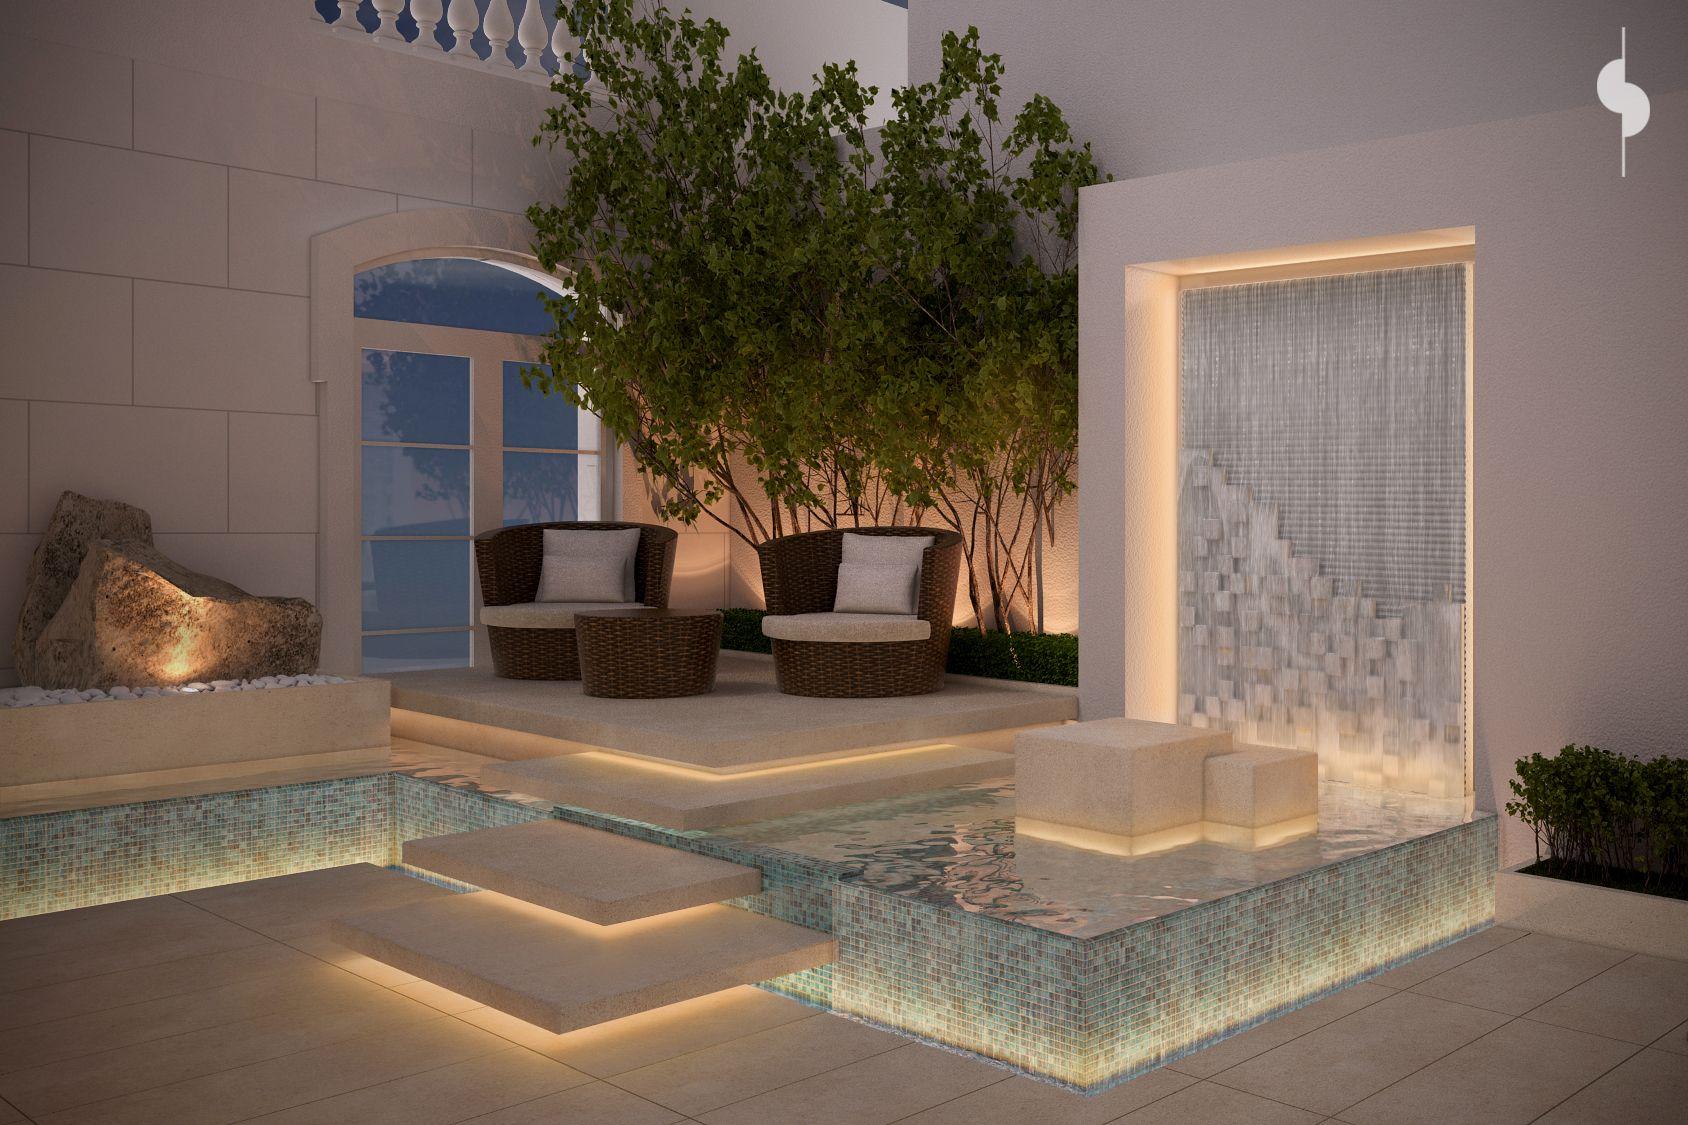 roof garden private villa sarah sadeq architects sarah sadeq architectes pinterest. Black Bedroom Furniture Sets. Home Design Ideas